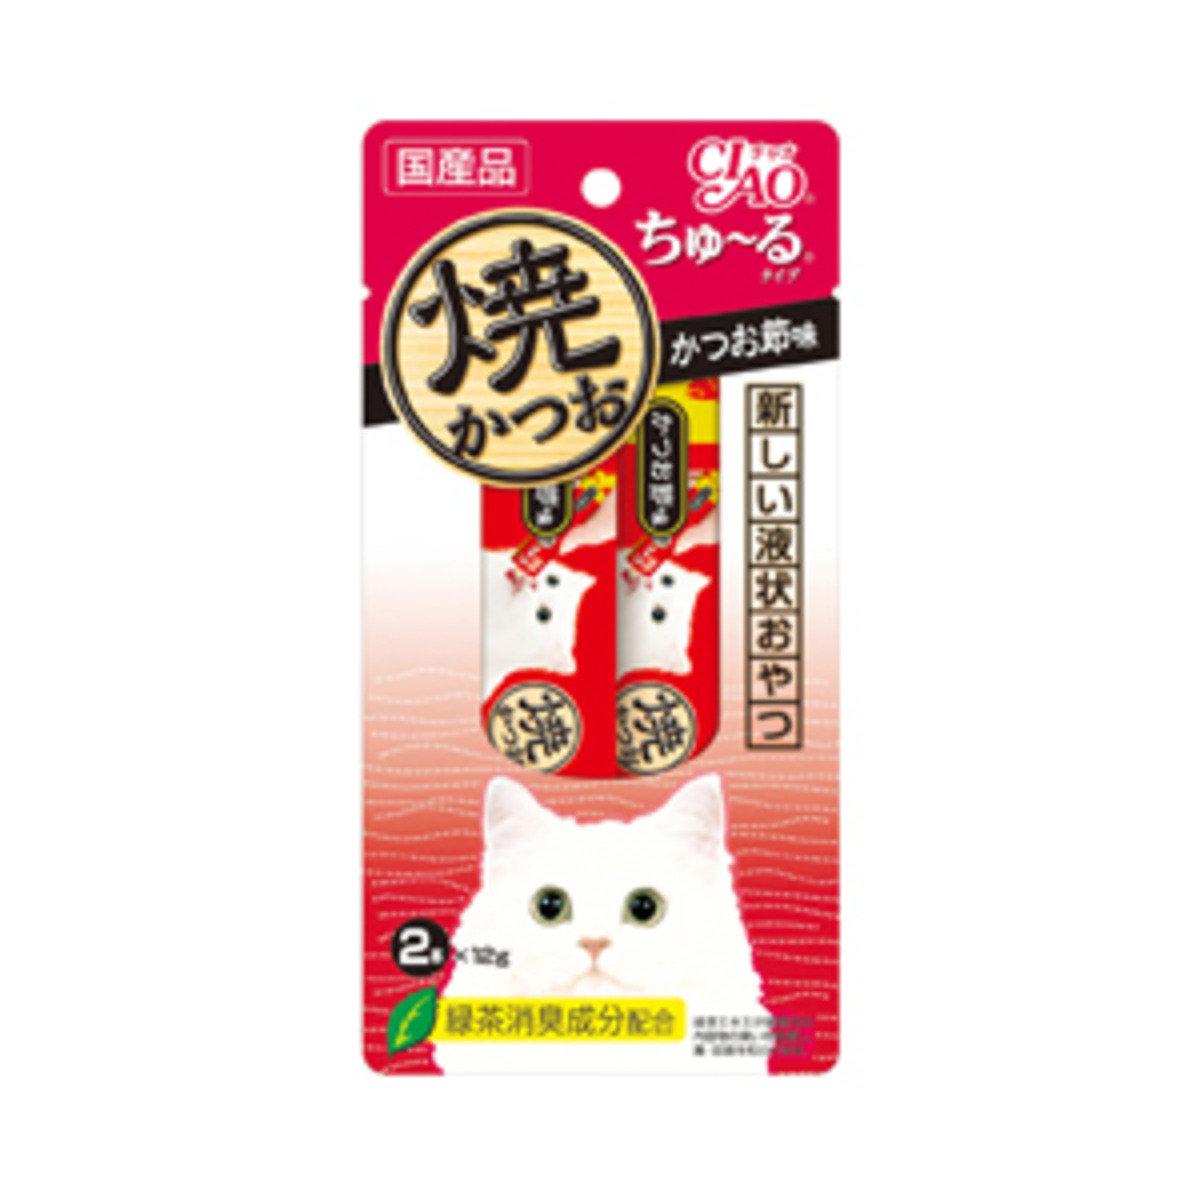 日本INABA綠茶烤鰹魚火鍋味濕糧 2R-104 (1包2本x12g)